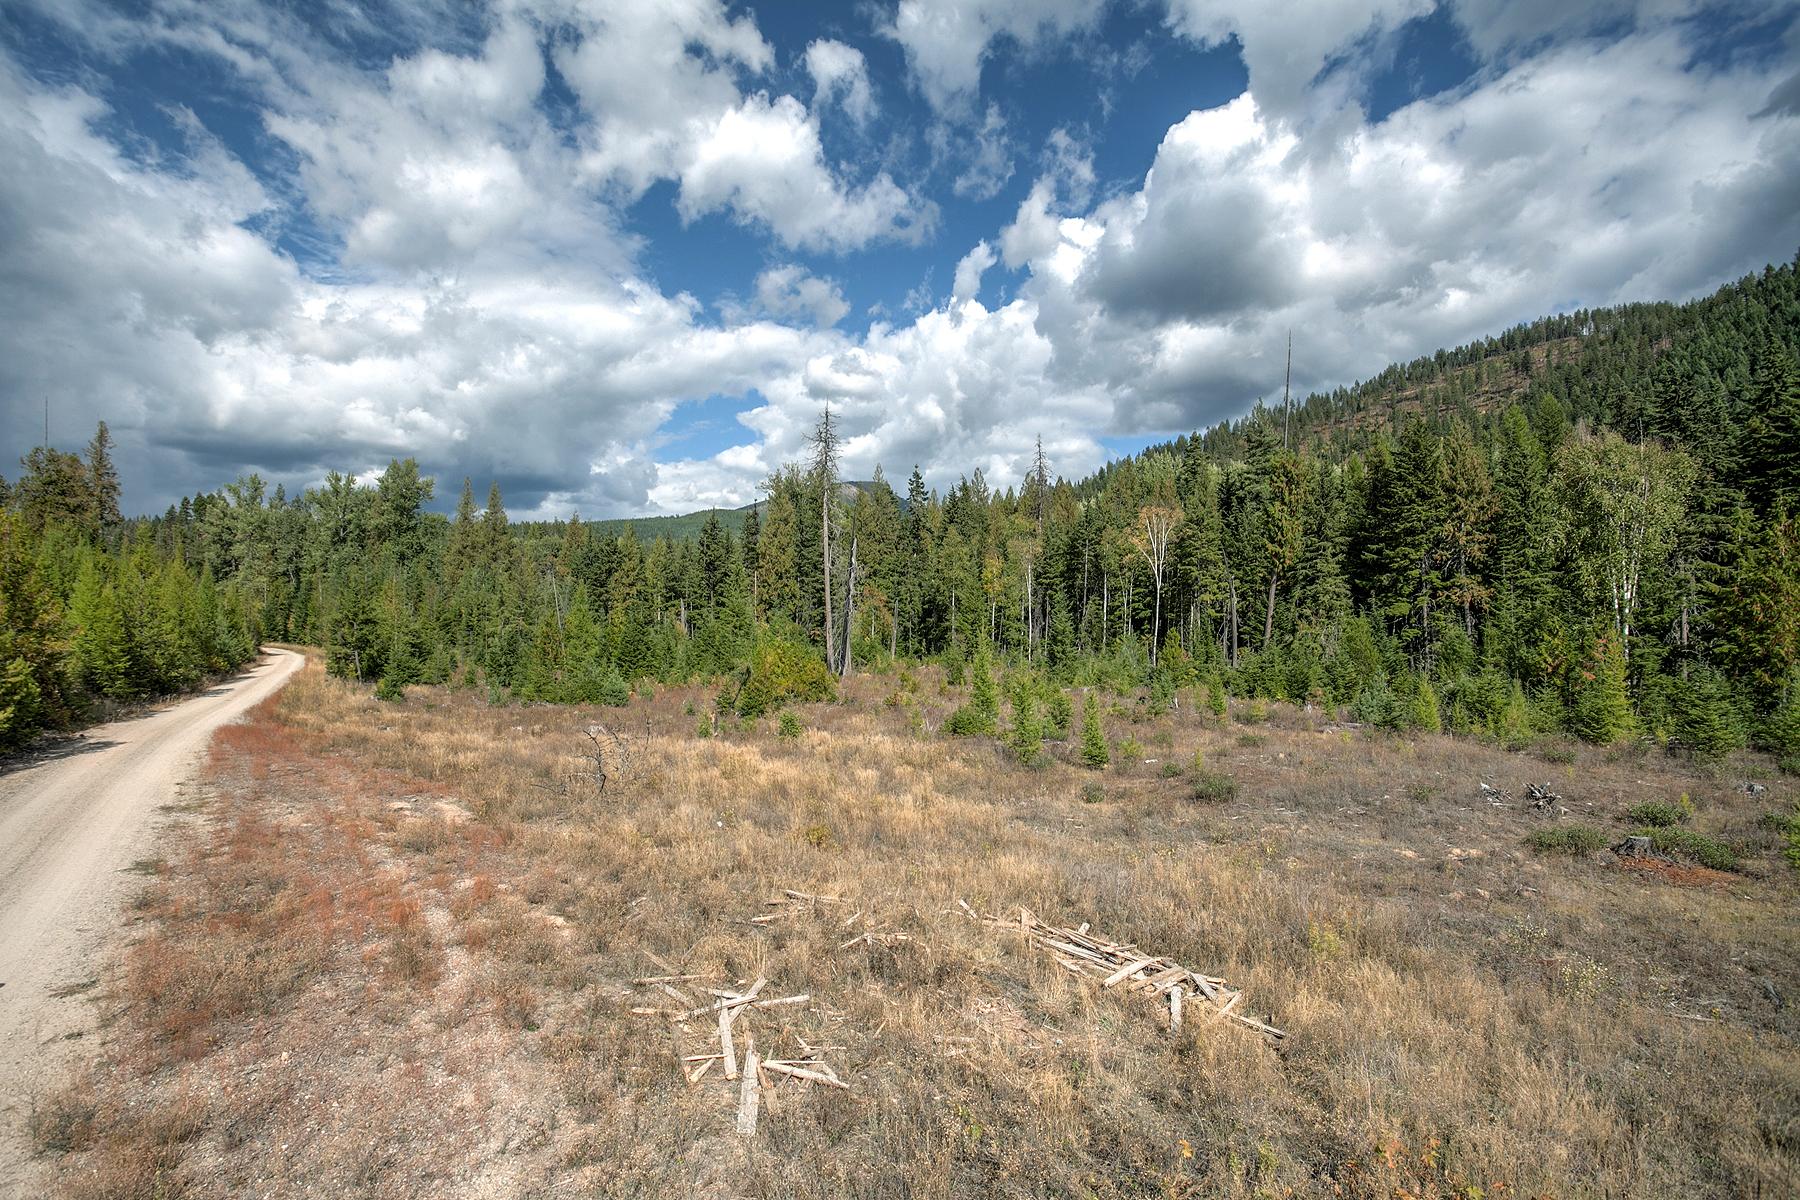 Land for Sale at BUSHWOOD ESTATES Lot 7 1406 Lost Creek Rd Coolin, Idaho 83821 United States